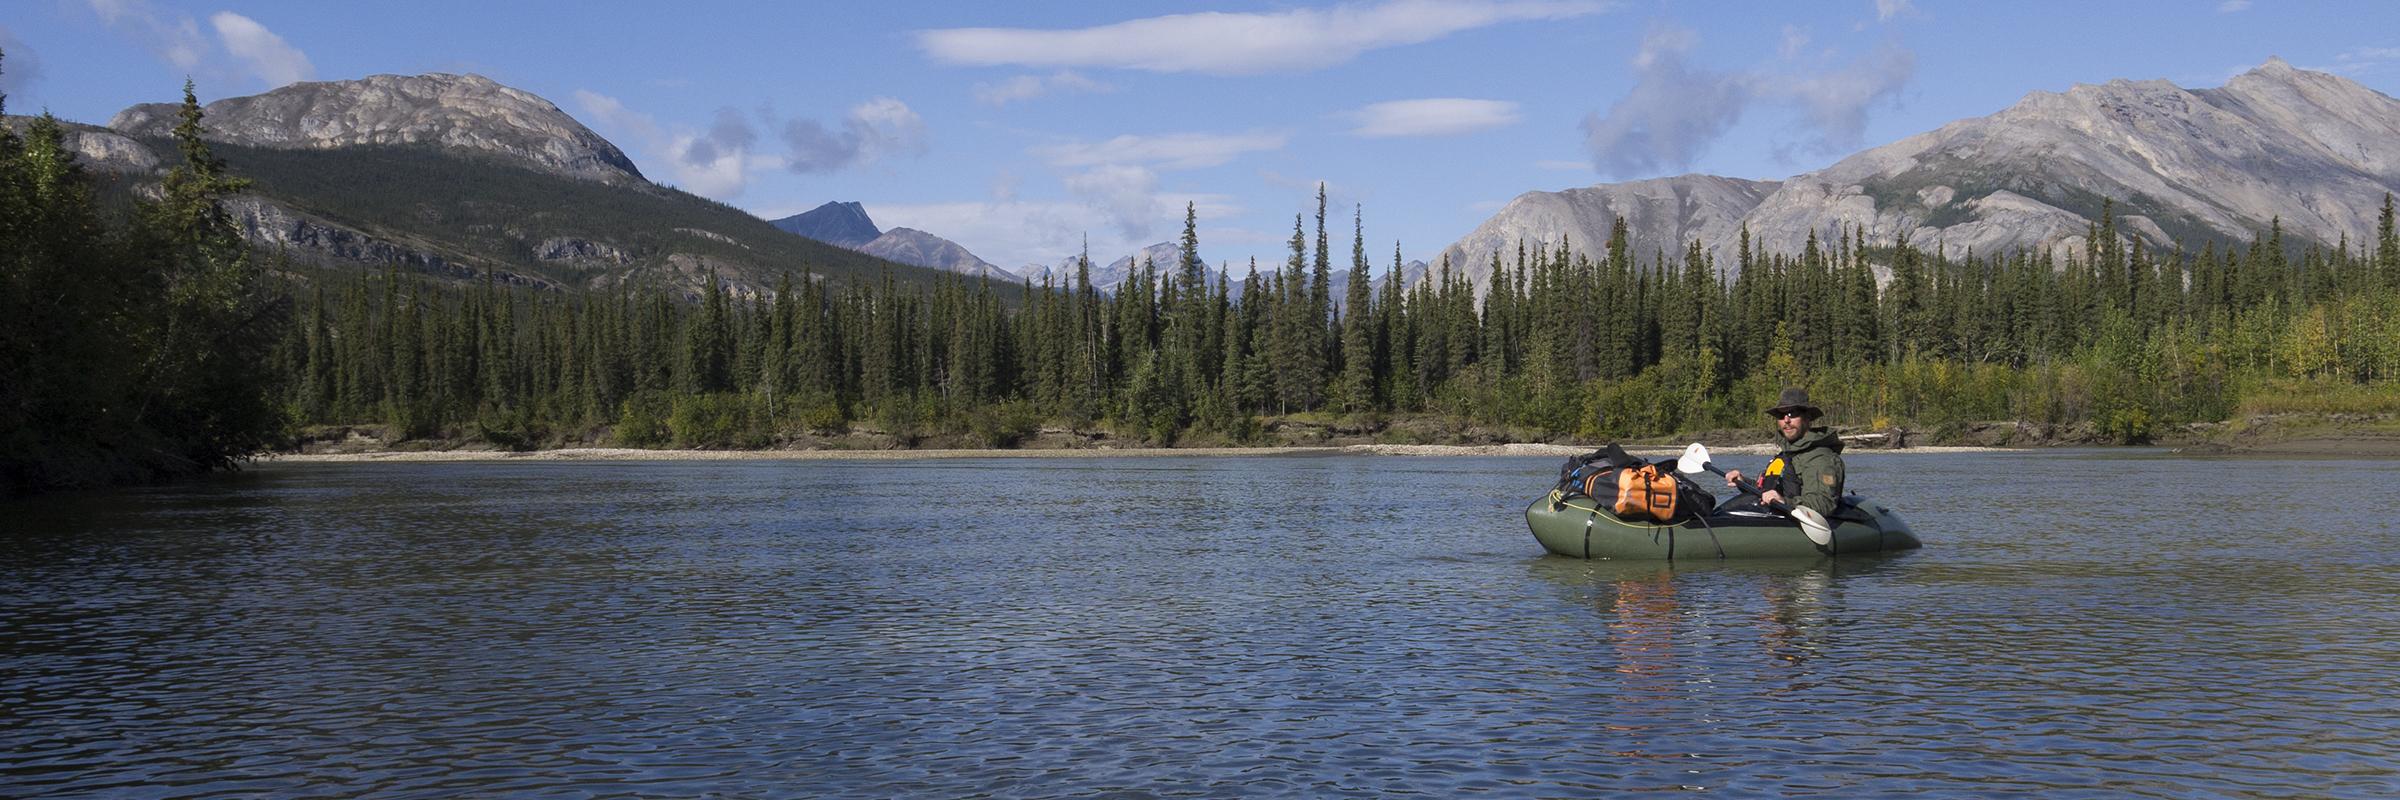 Peter_Persson_Alaska